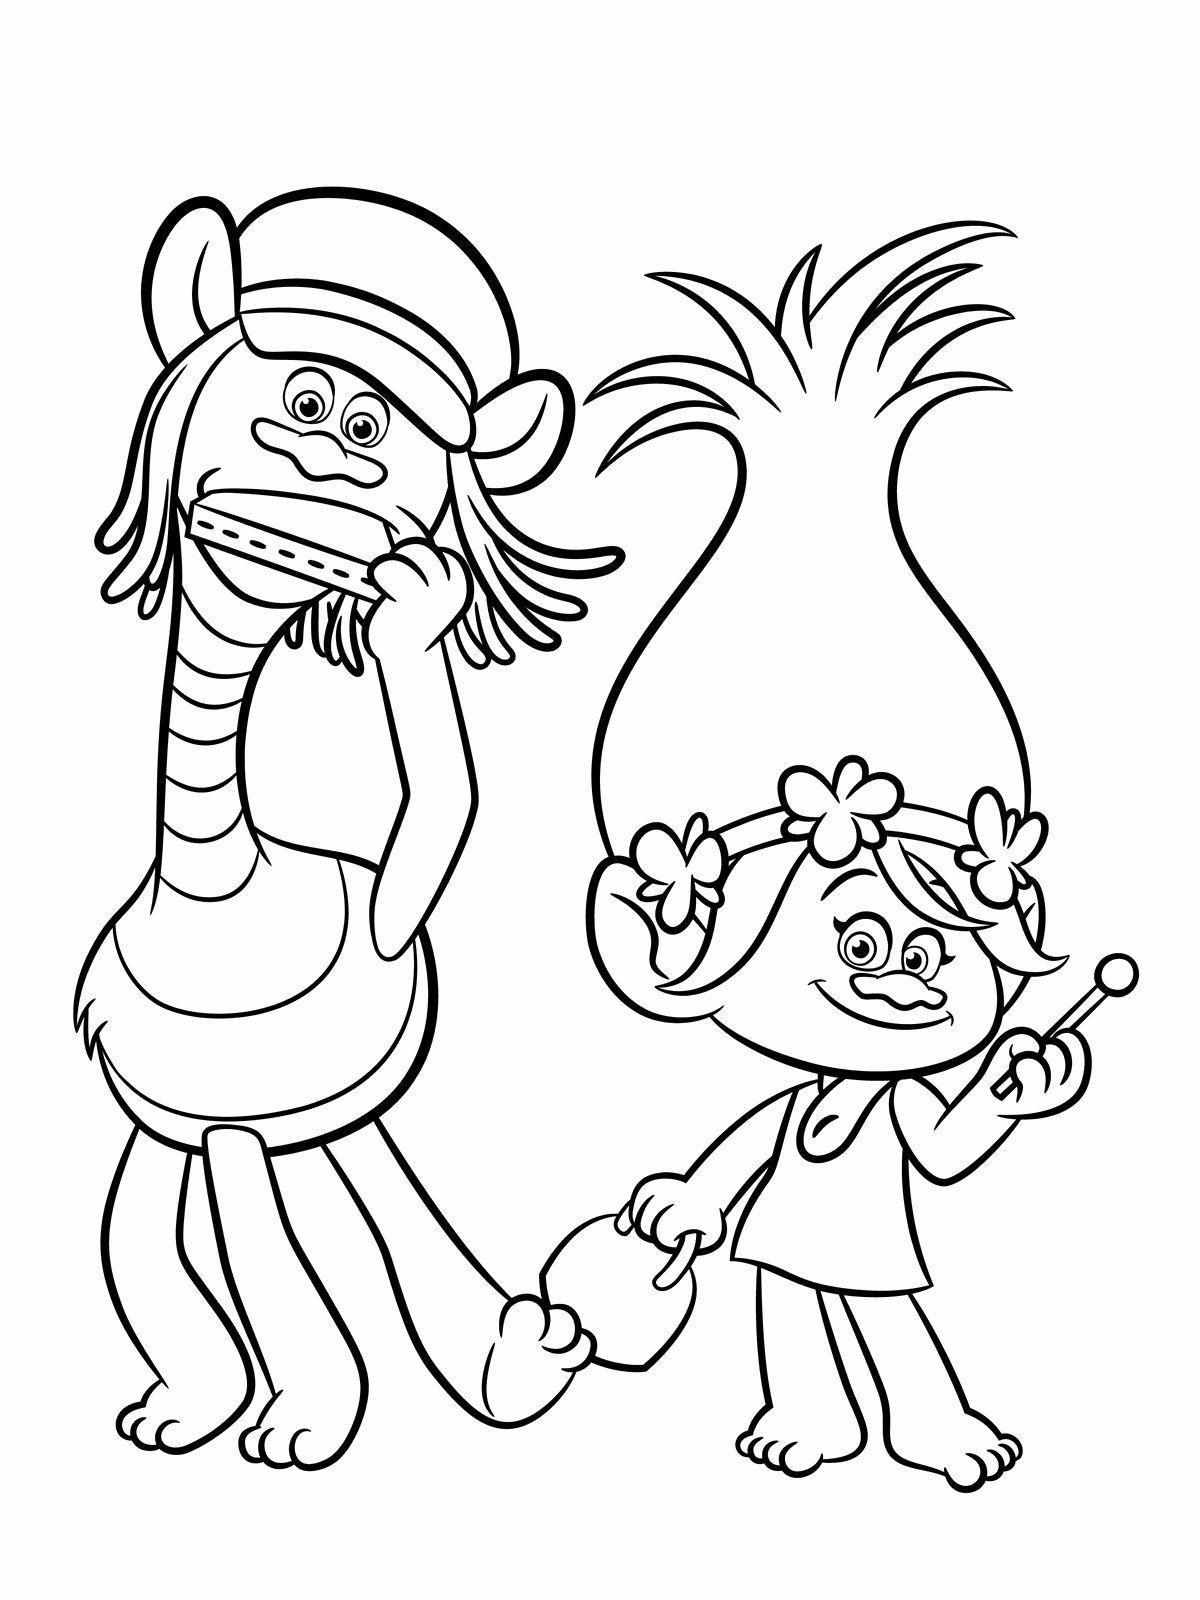 Best Coloring Books Elegant Disney Coloring Pages Best Coloring Pages For Kids Poppy Coloring Page Disney Coloring Pages Cartoon Coloring Pages